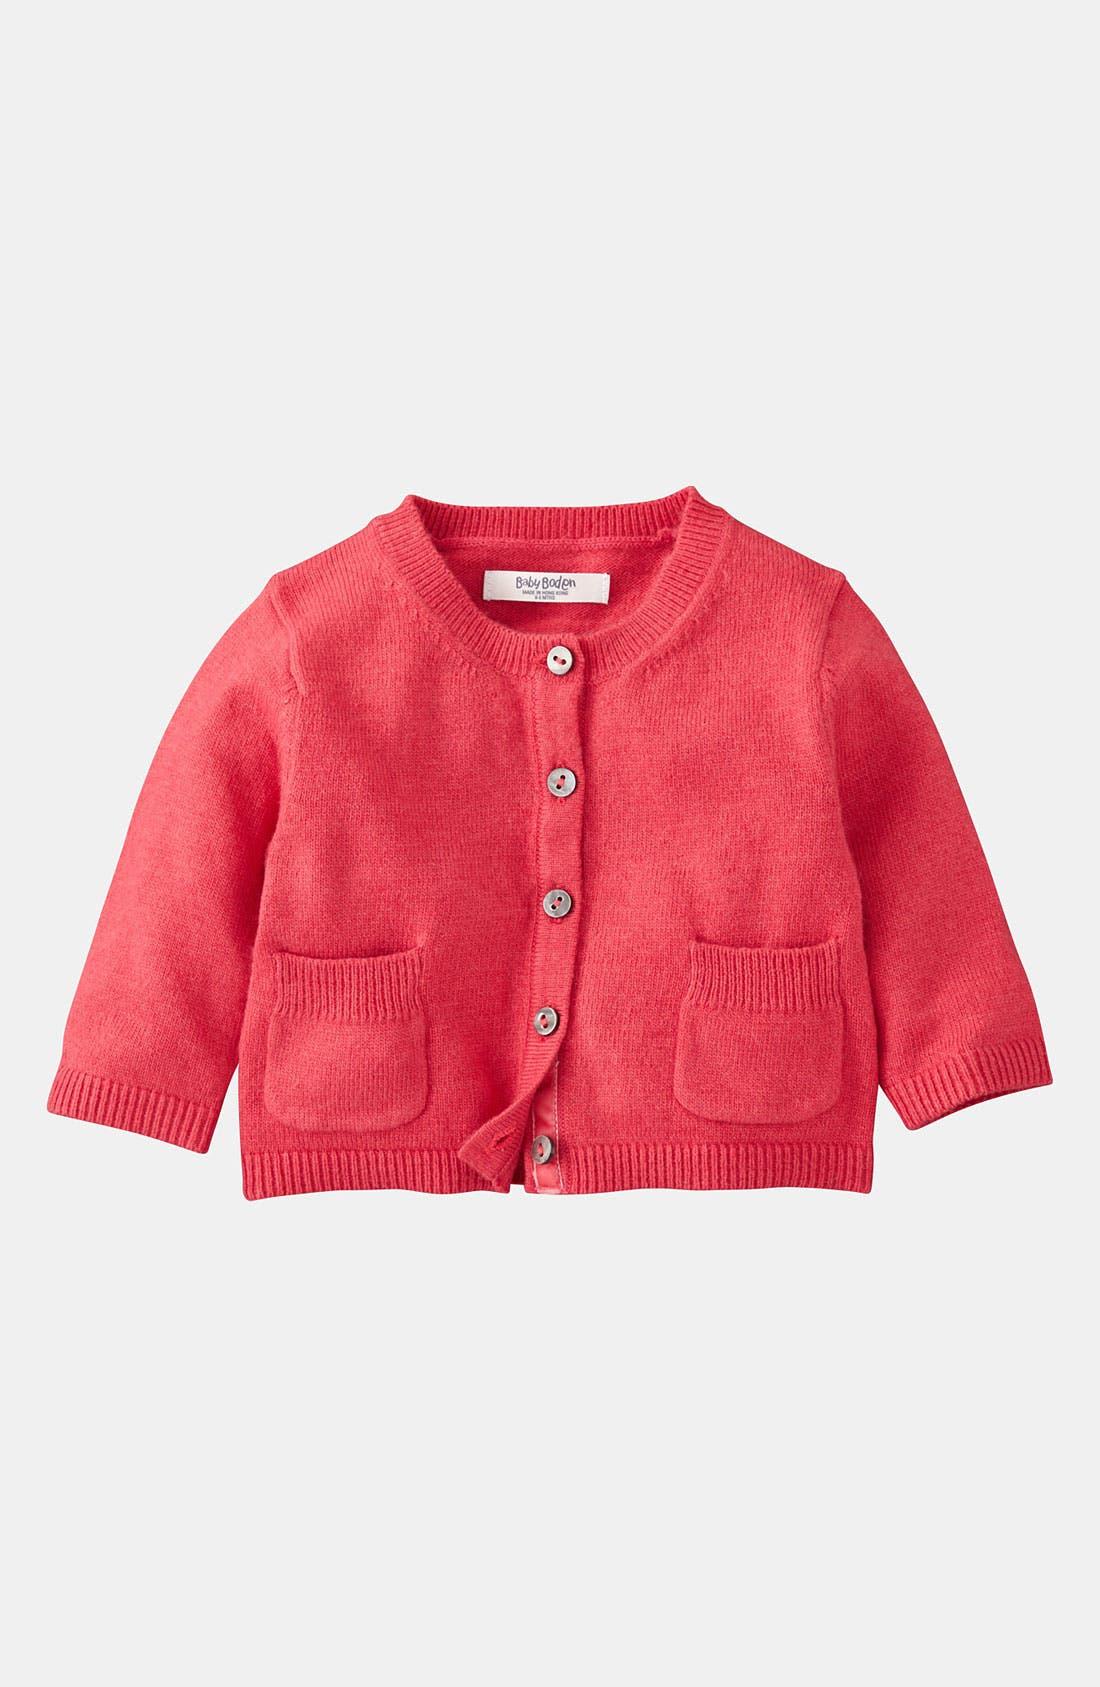 Alternate Image 1 Selected - Mini Boden 'Baby' Cardigan (Infant)